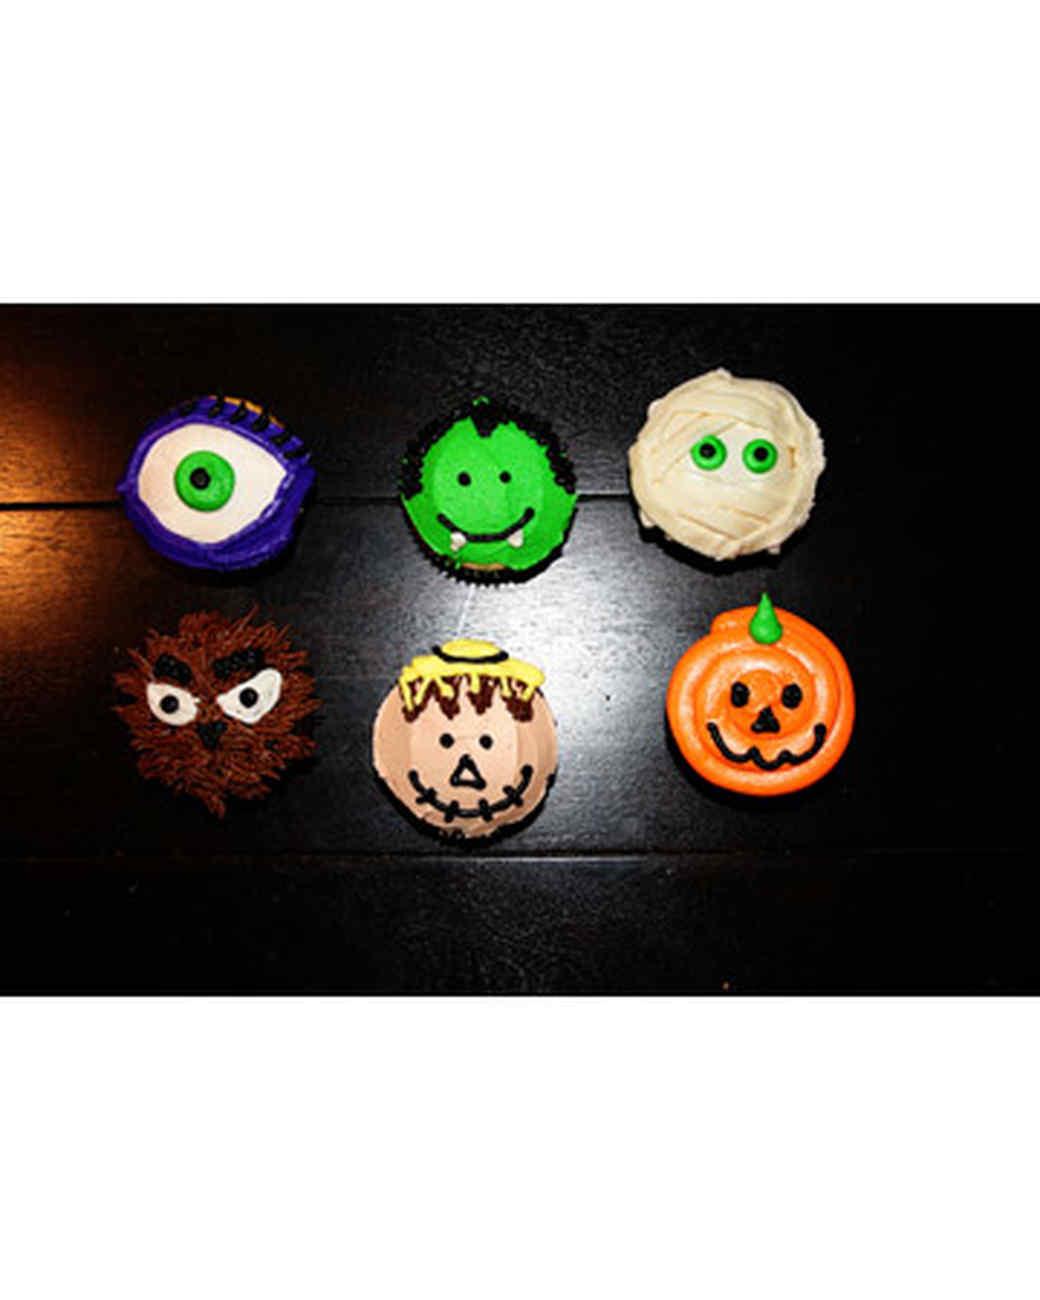 halloween_ugc09_monster_cupcakes.jpg